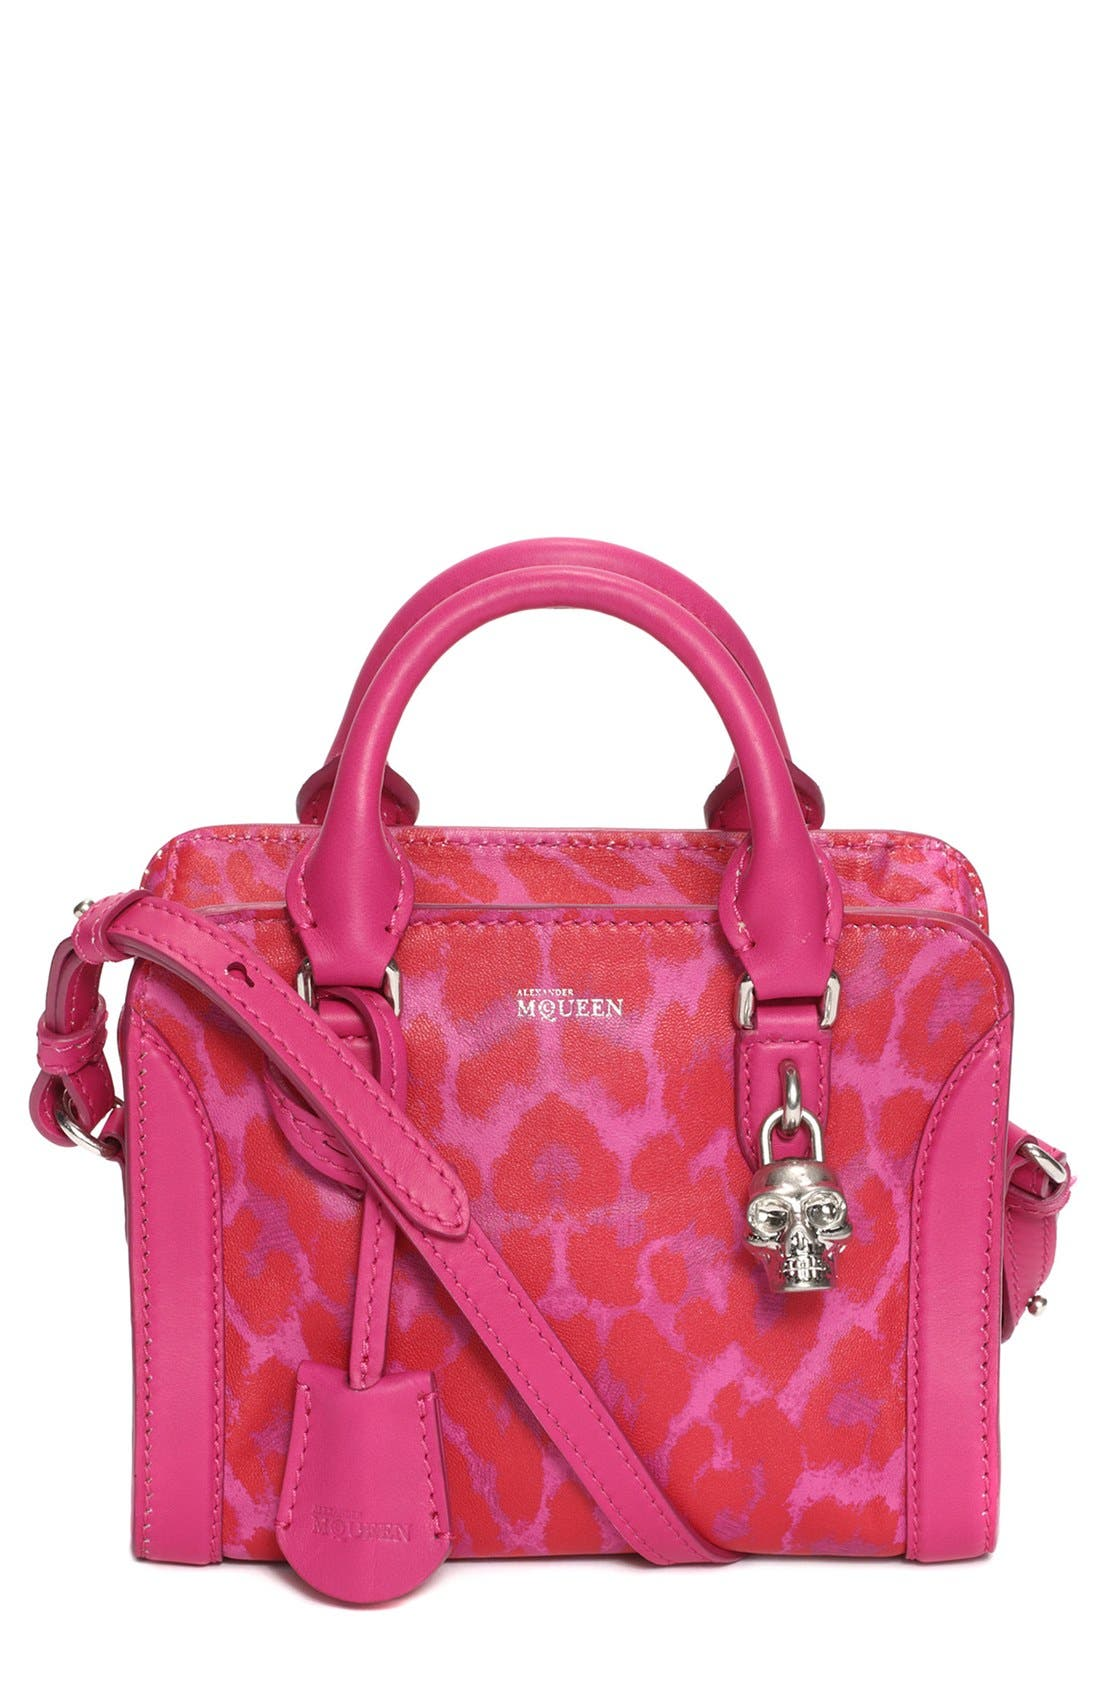 Main Image - Alexander McQueen 'Mini Padlock' Leopard Print Leather Duffel Bag